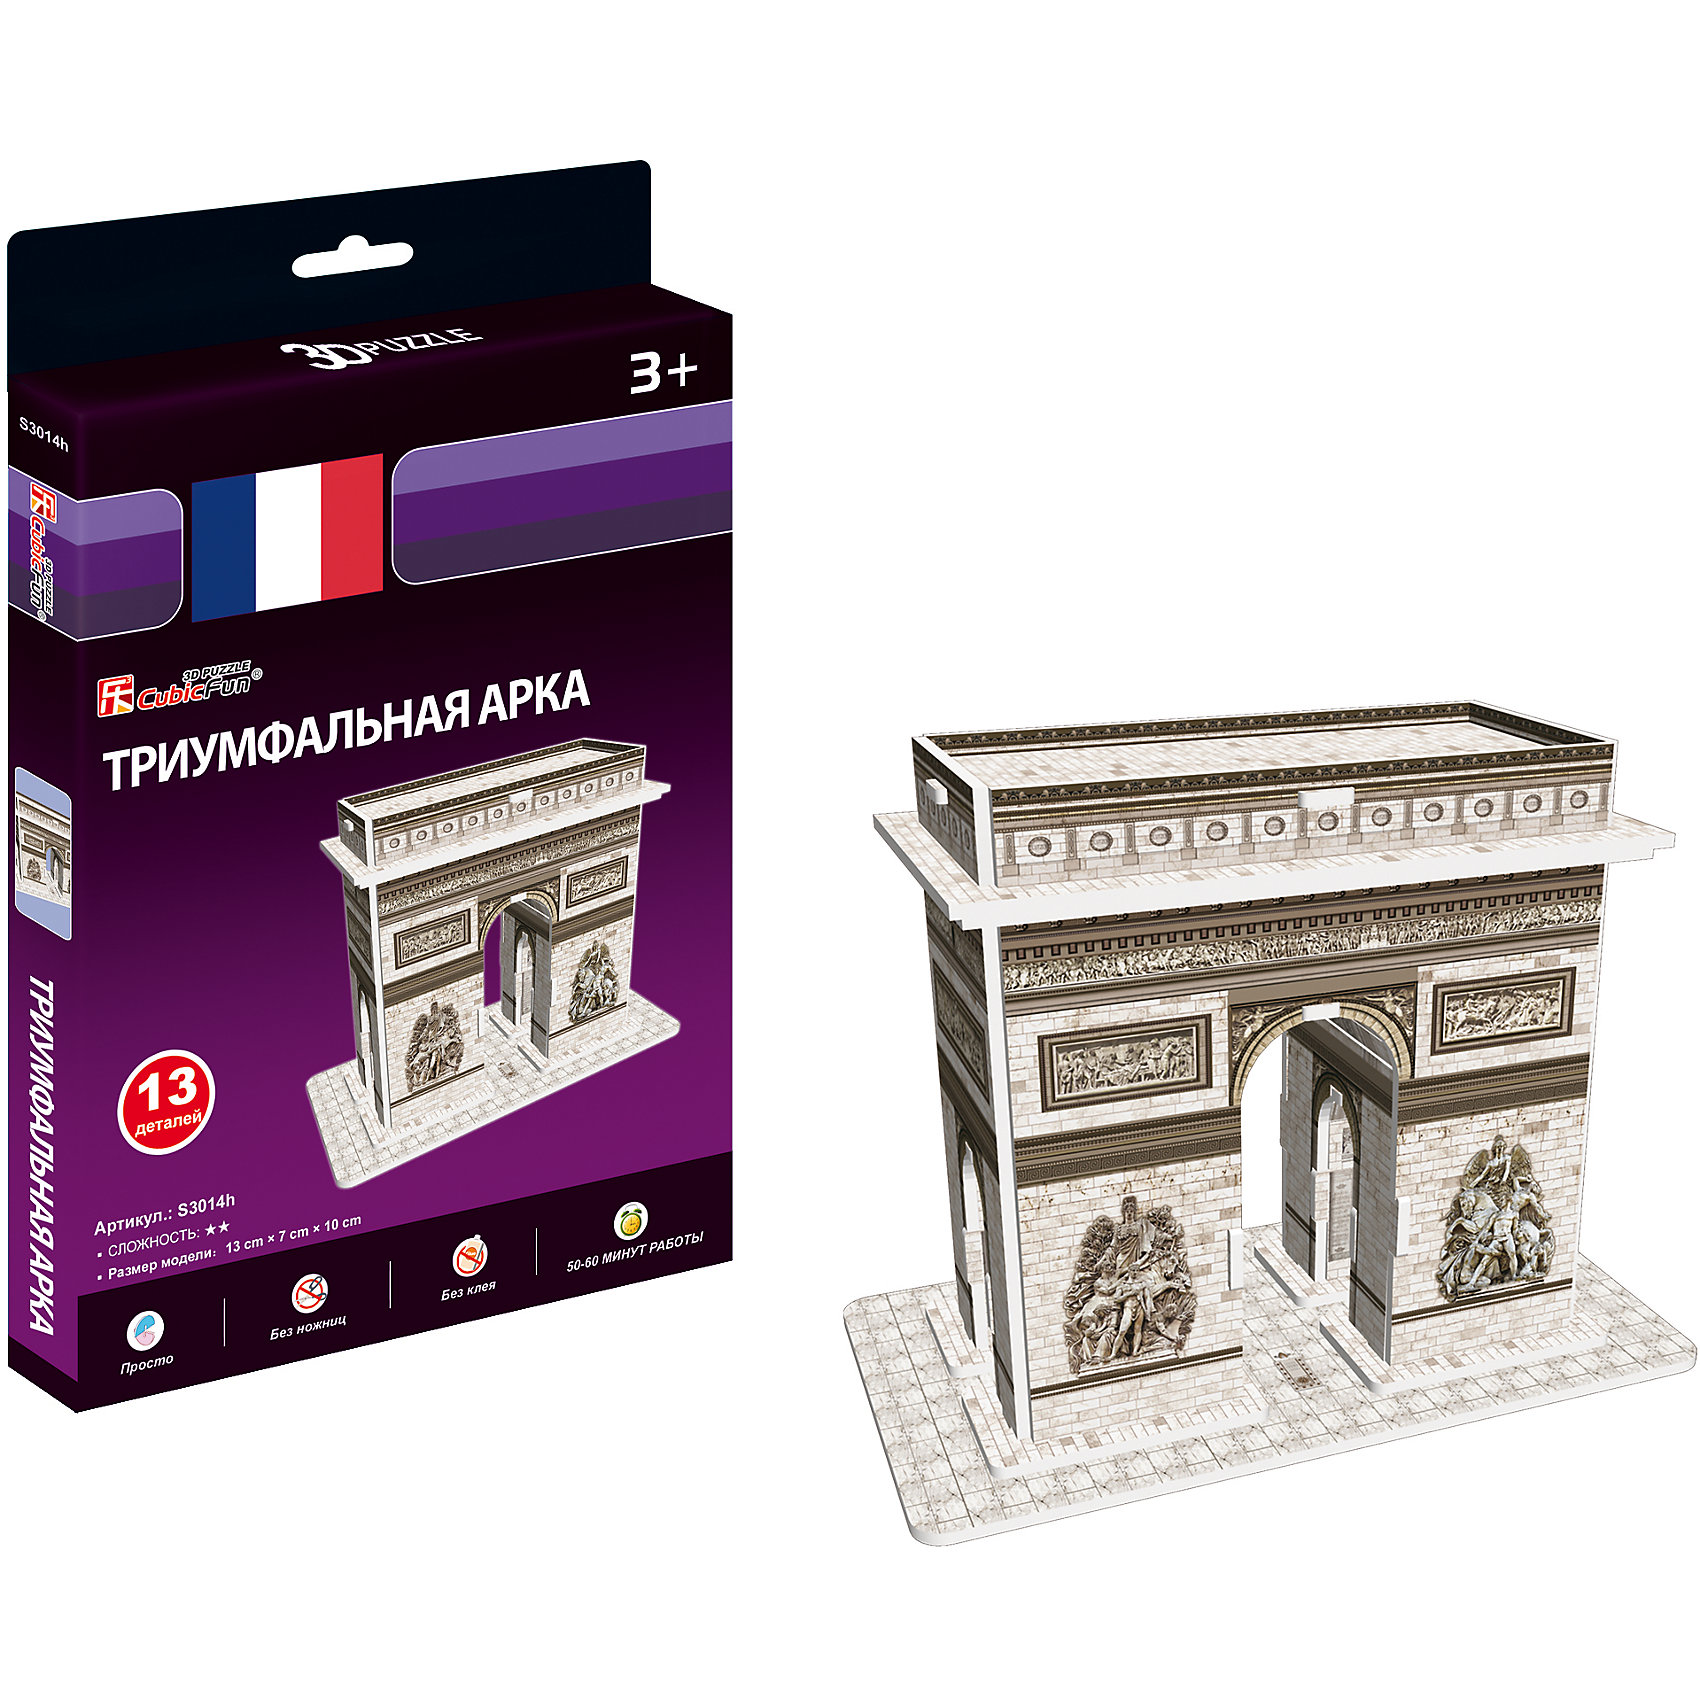 CubicFun Триумфальная арка, Франция, CubicFun конструкторы cubicfun 3d пазл эйфелева башня 2 франция